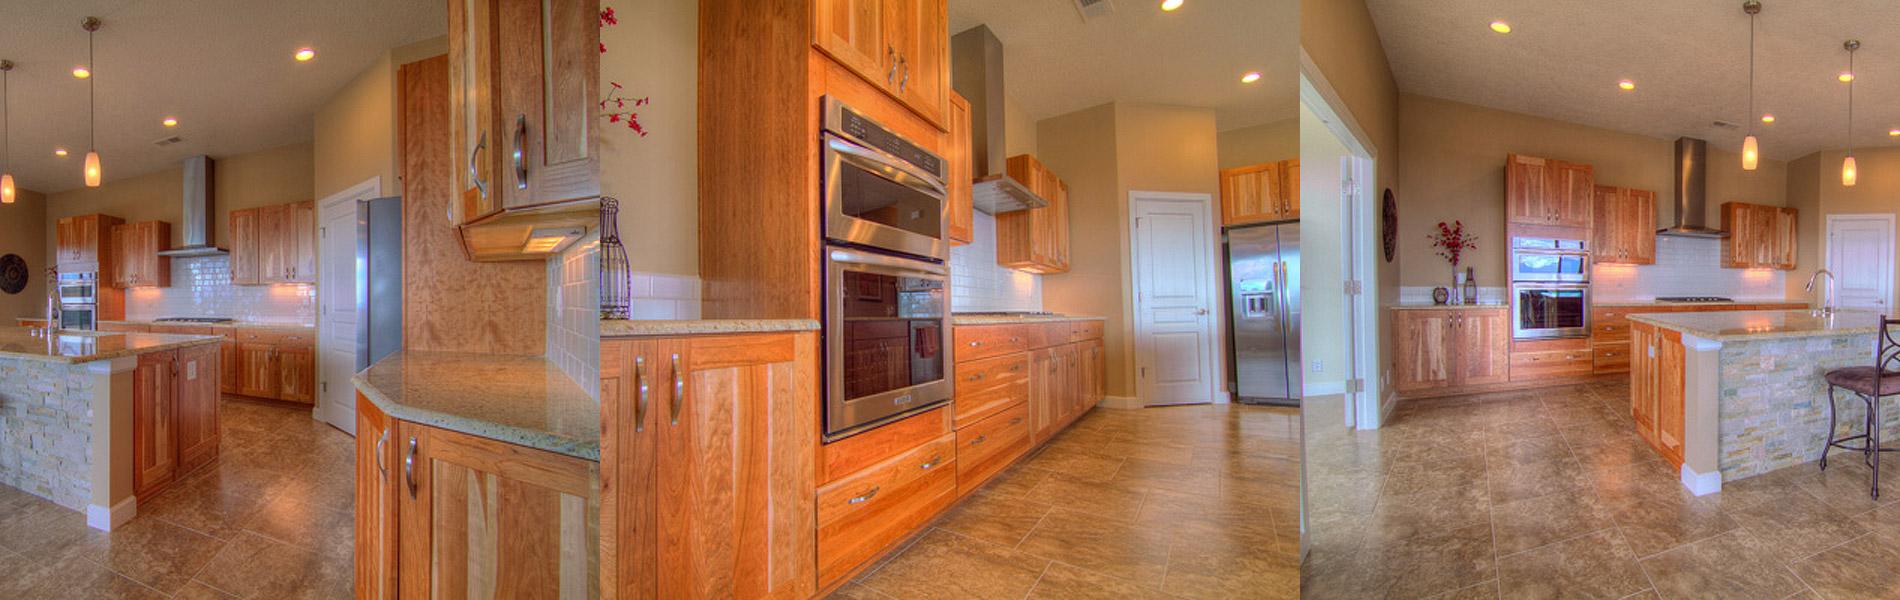 Albuquerque Custom Home Builder Project Image